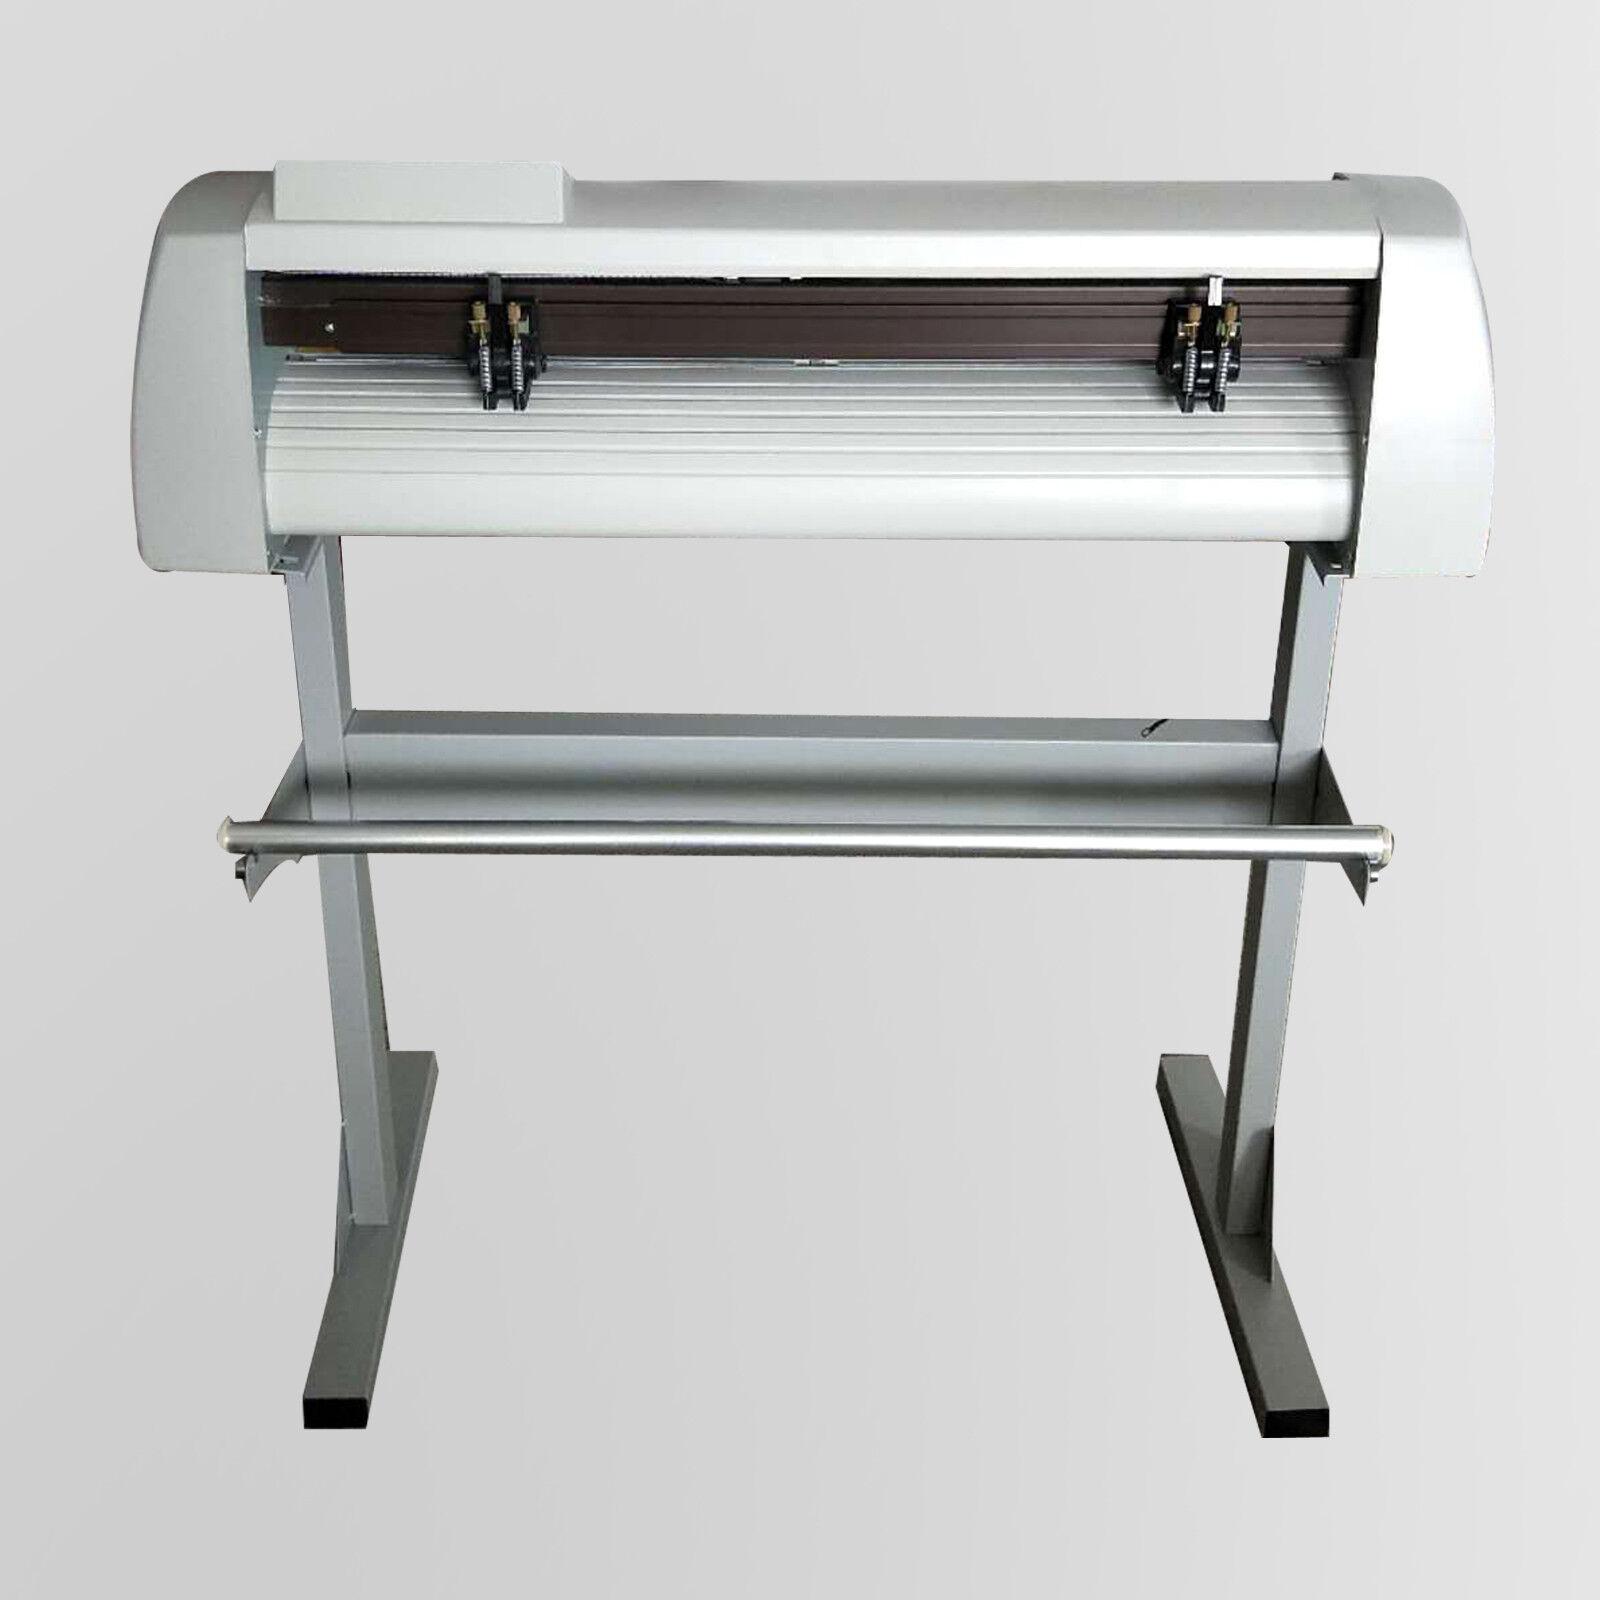 "28"" GJD Cutting Plotter Vinyl Cutter Aluminum Stand One Value GJD-800"